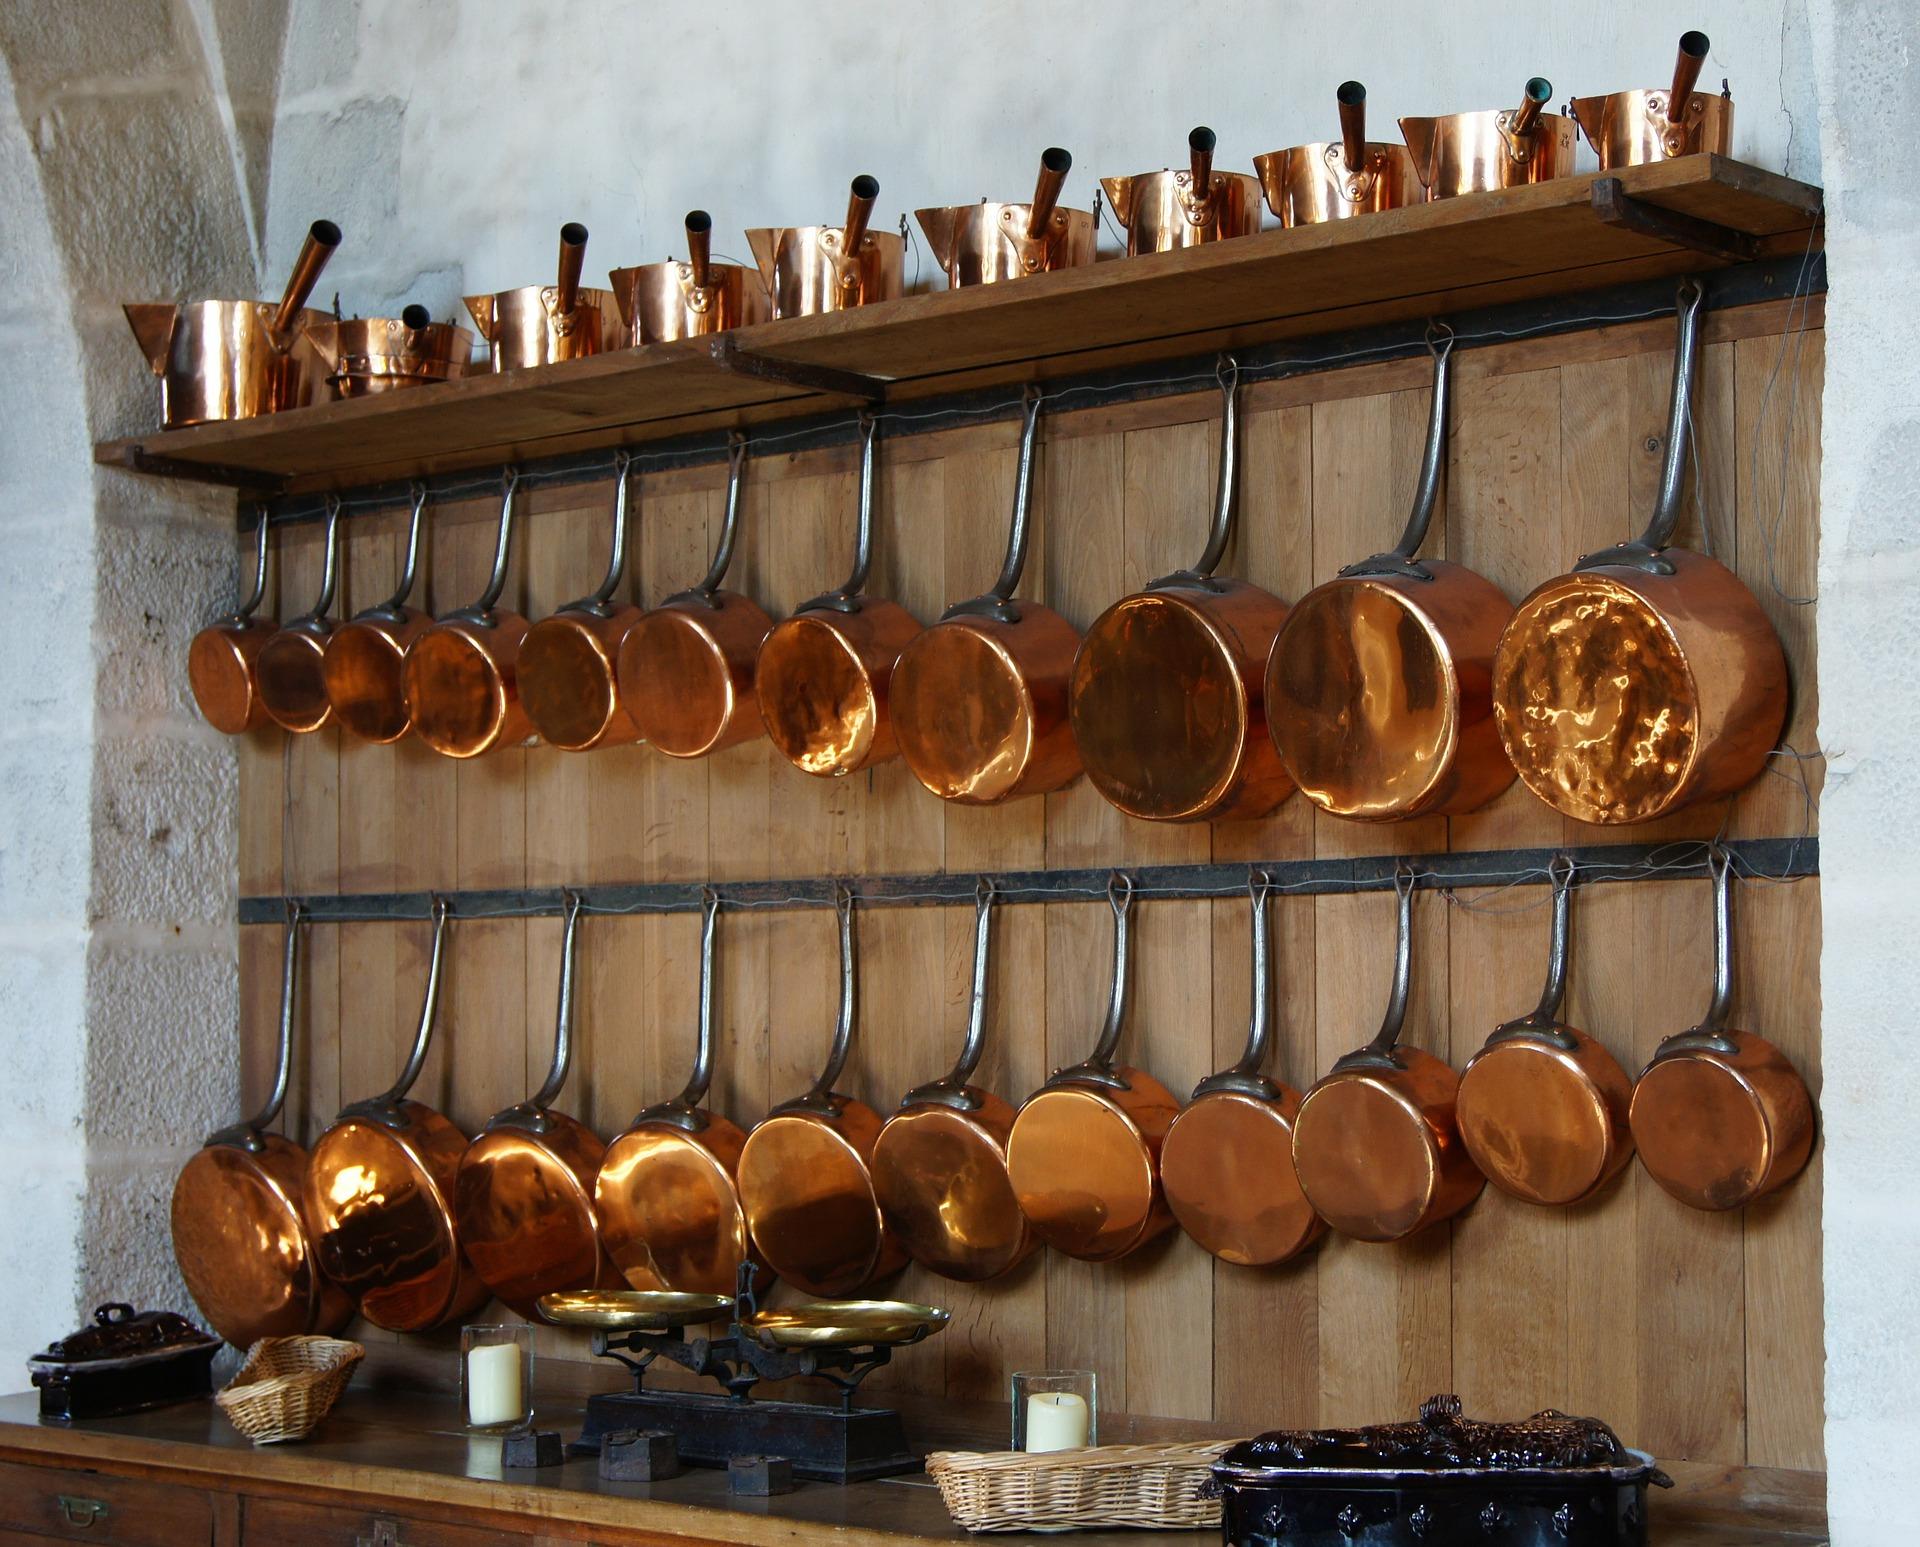 copper pots alternative absorption of copper